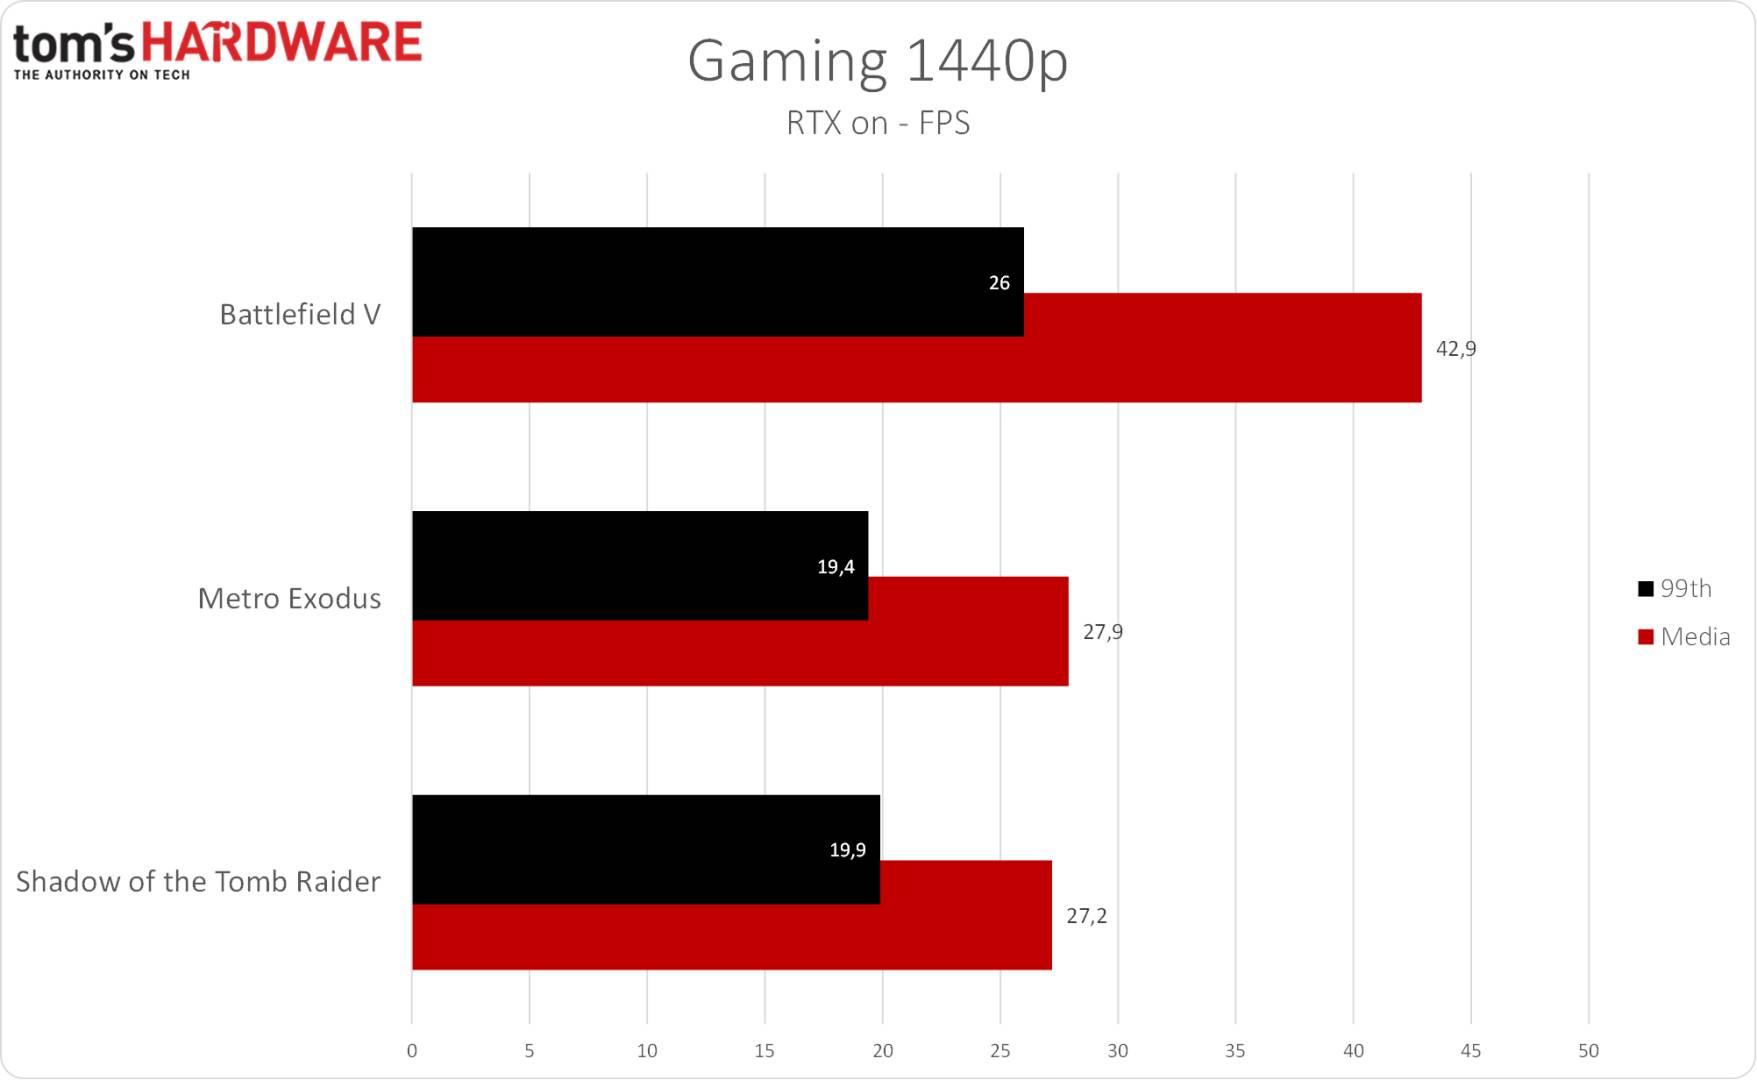 Eurocom Nightsky RX15 - Gaming 1440p RTX